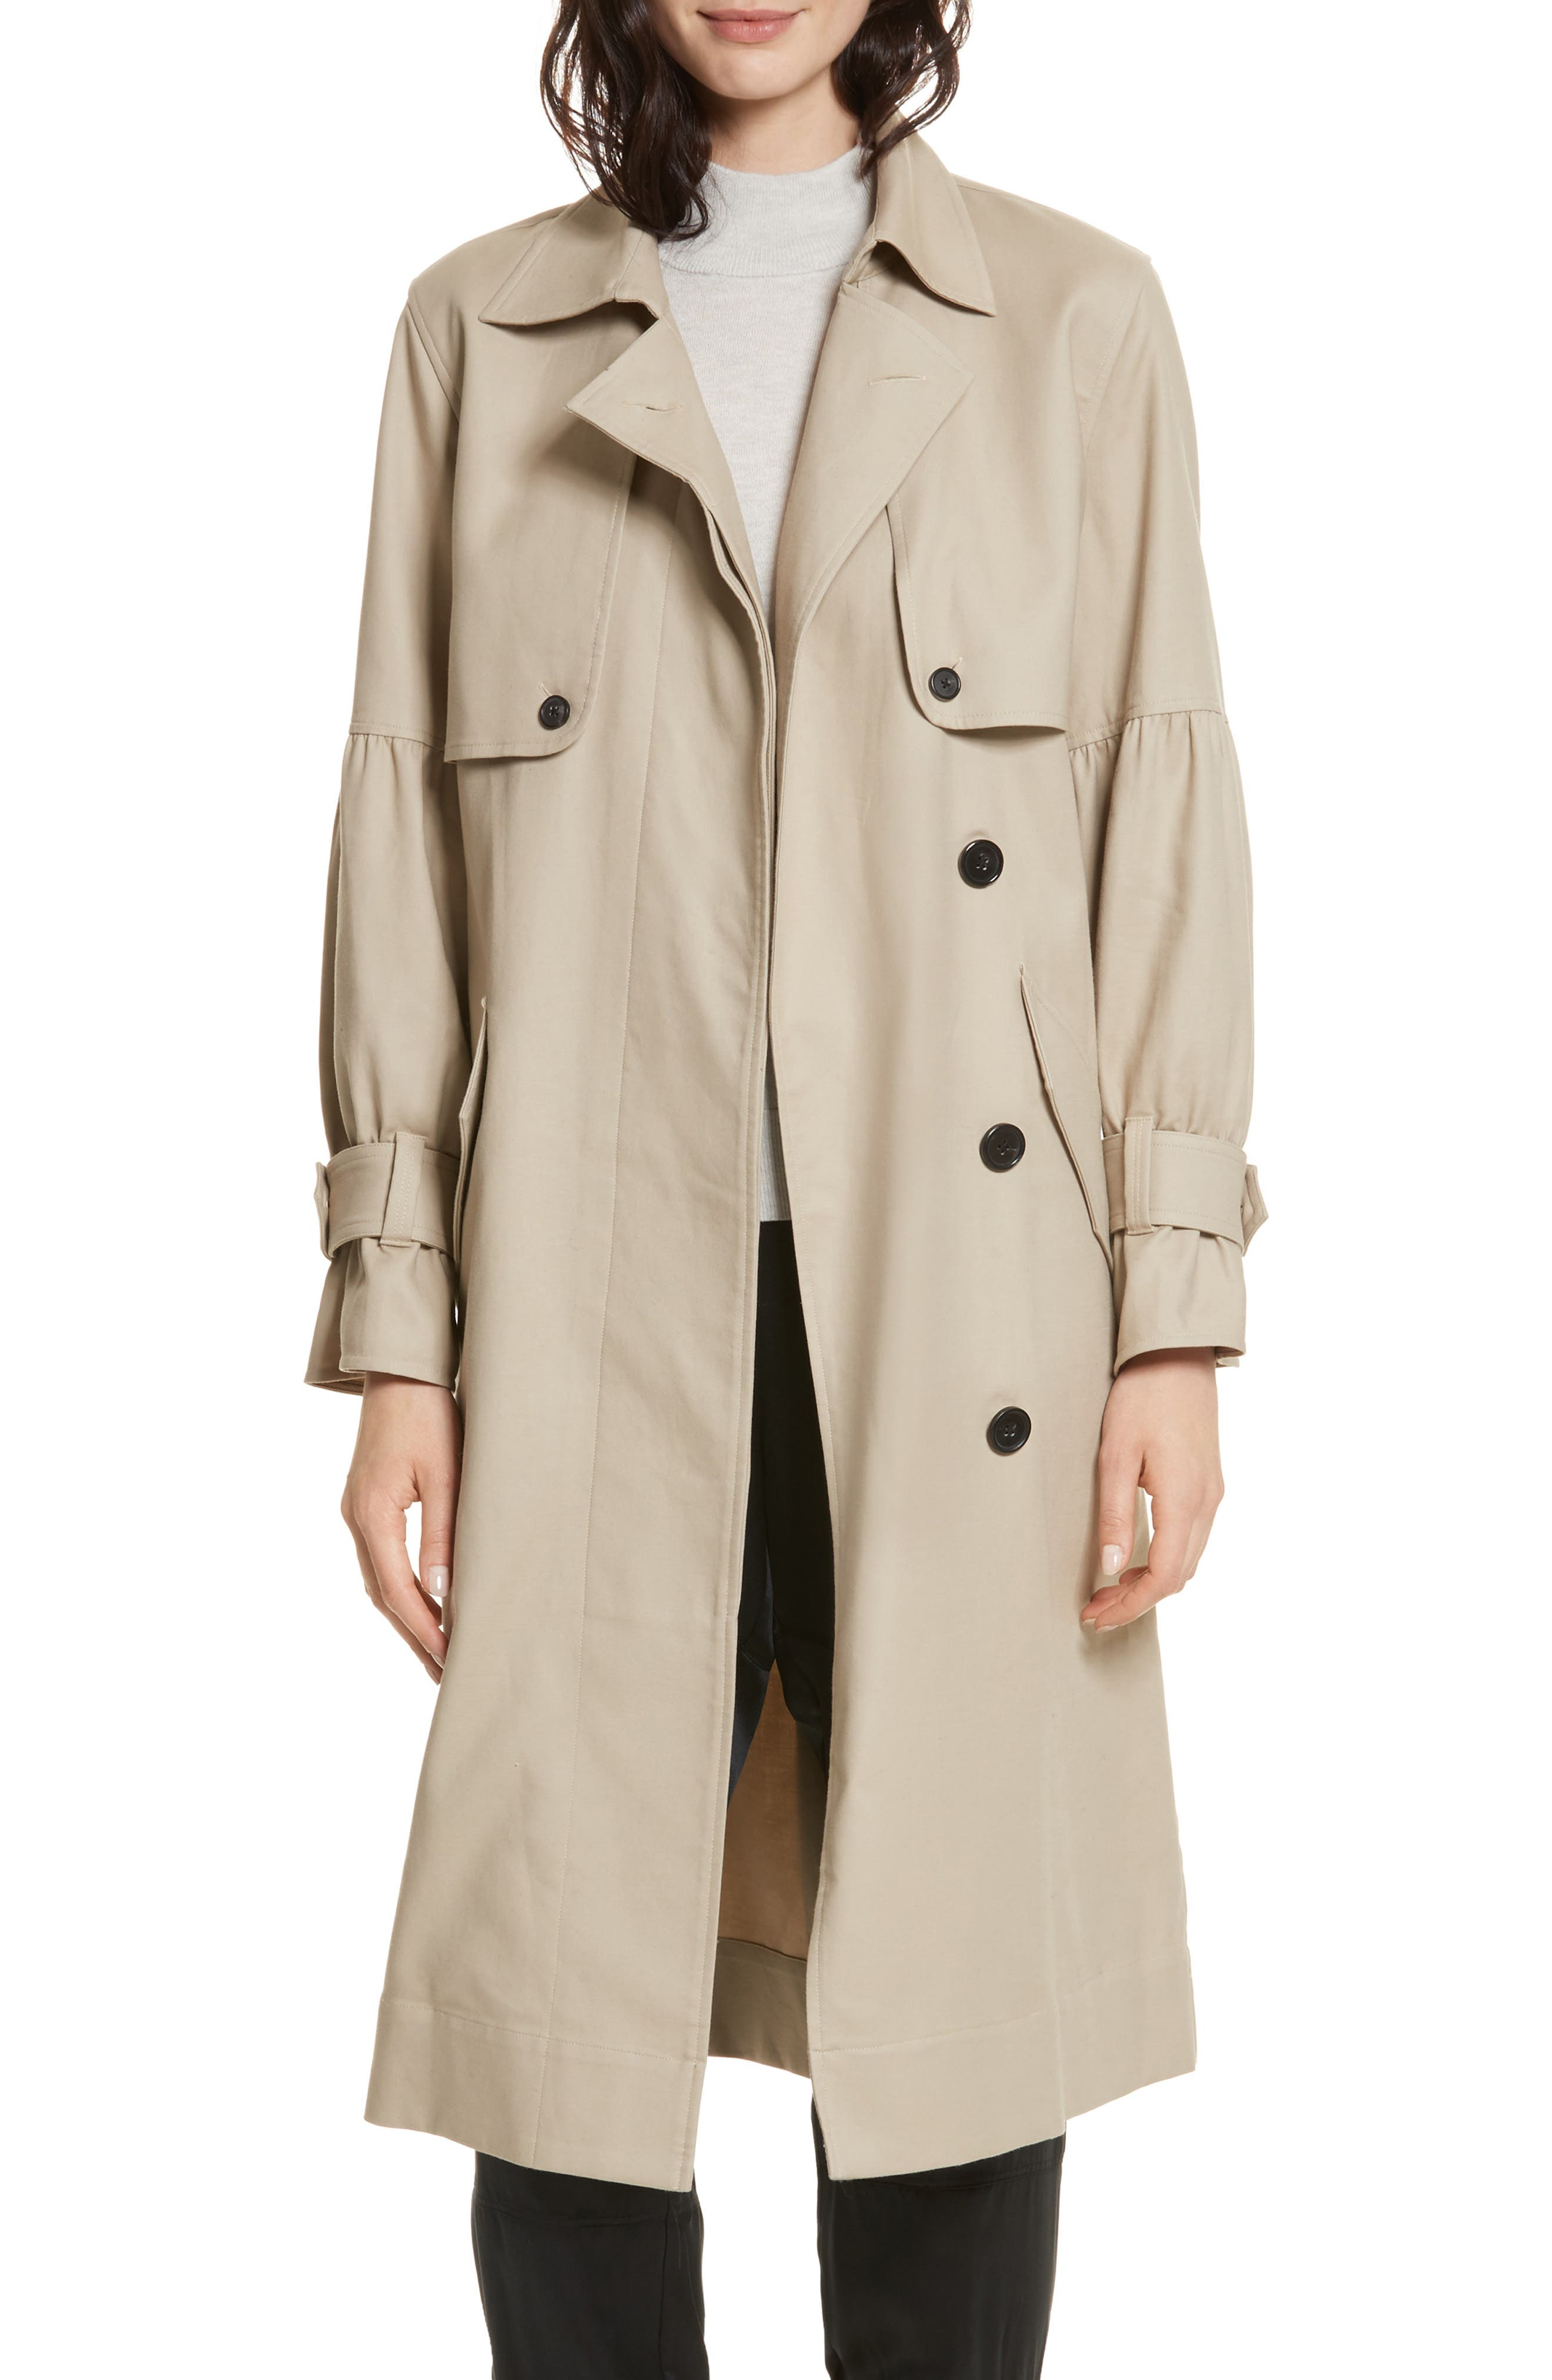 Joie Alwena Cotton Trench Coat